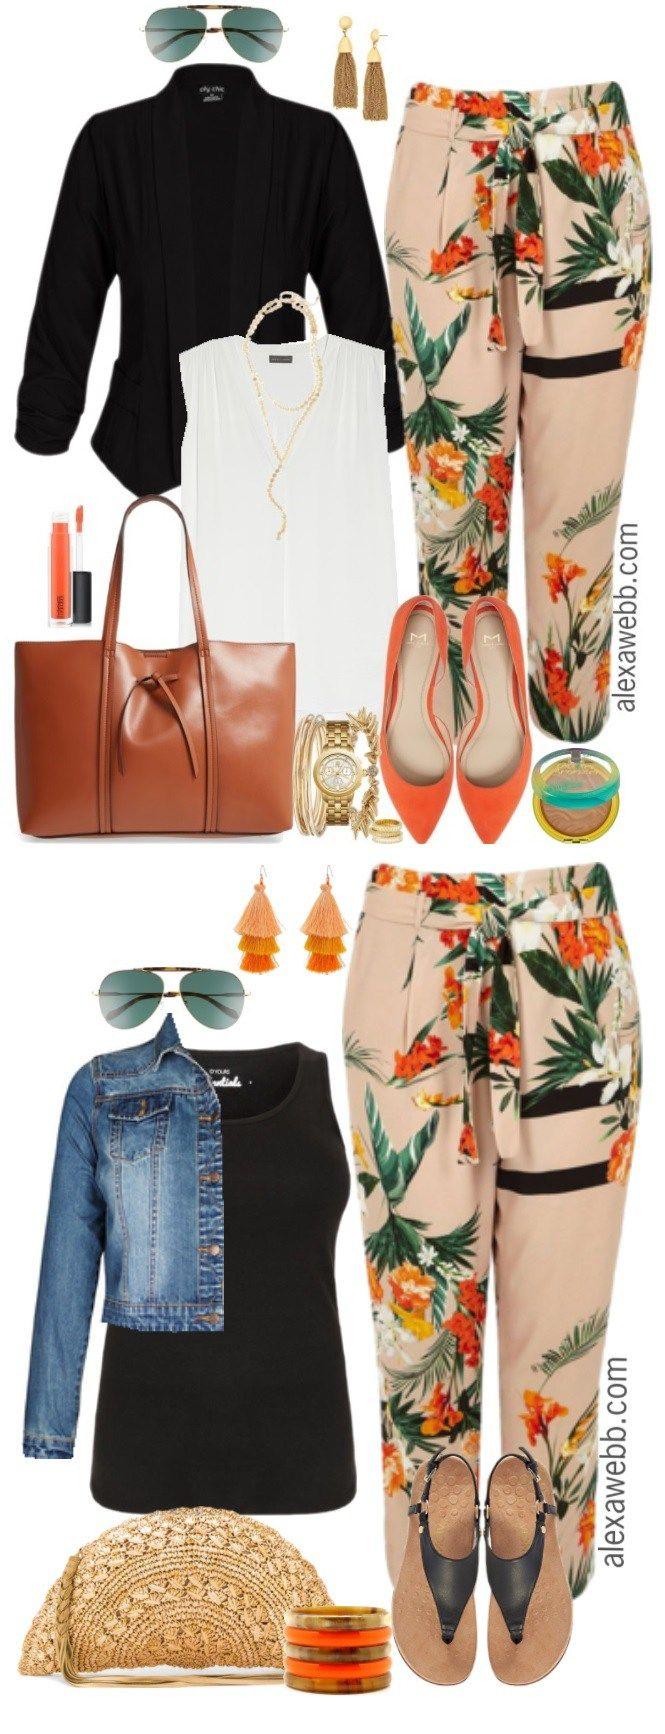 Plus Size Tropical Pants Outfits - Plus Size Spring Work Outfit - Plus Size Fashion for Women - alexawebb.com #alexawebb #plussize